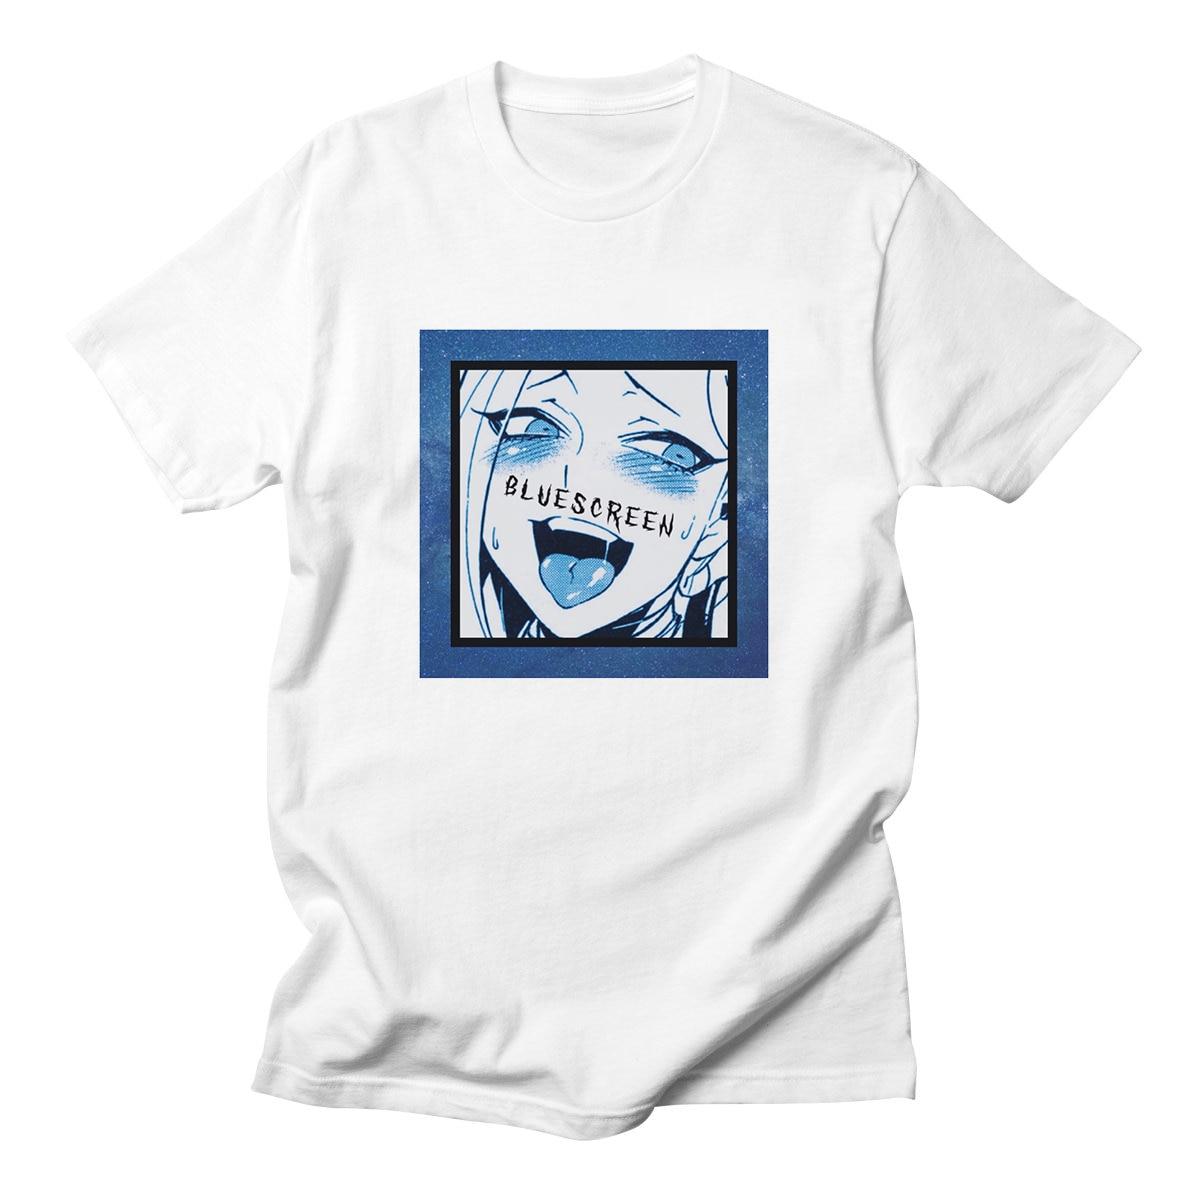 Ahegao   T     Shirts   Harajuku FaceFunny Shy Kawaii Girl Sexy Men Unisex Short Sleeve Anime Top Clothes 100% Cotton Tees